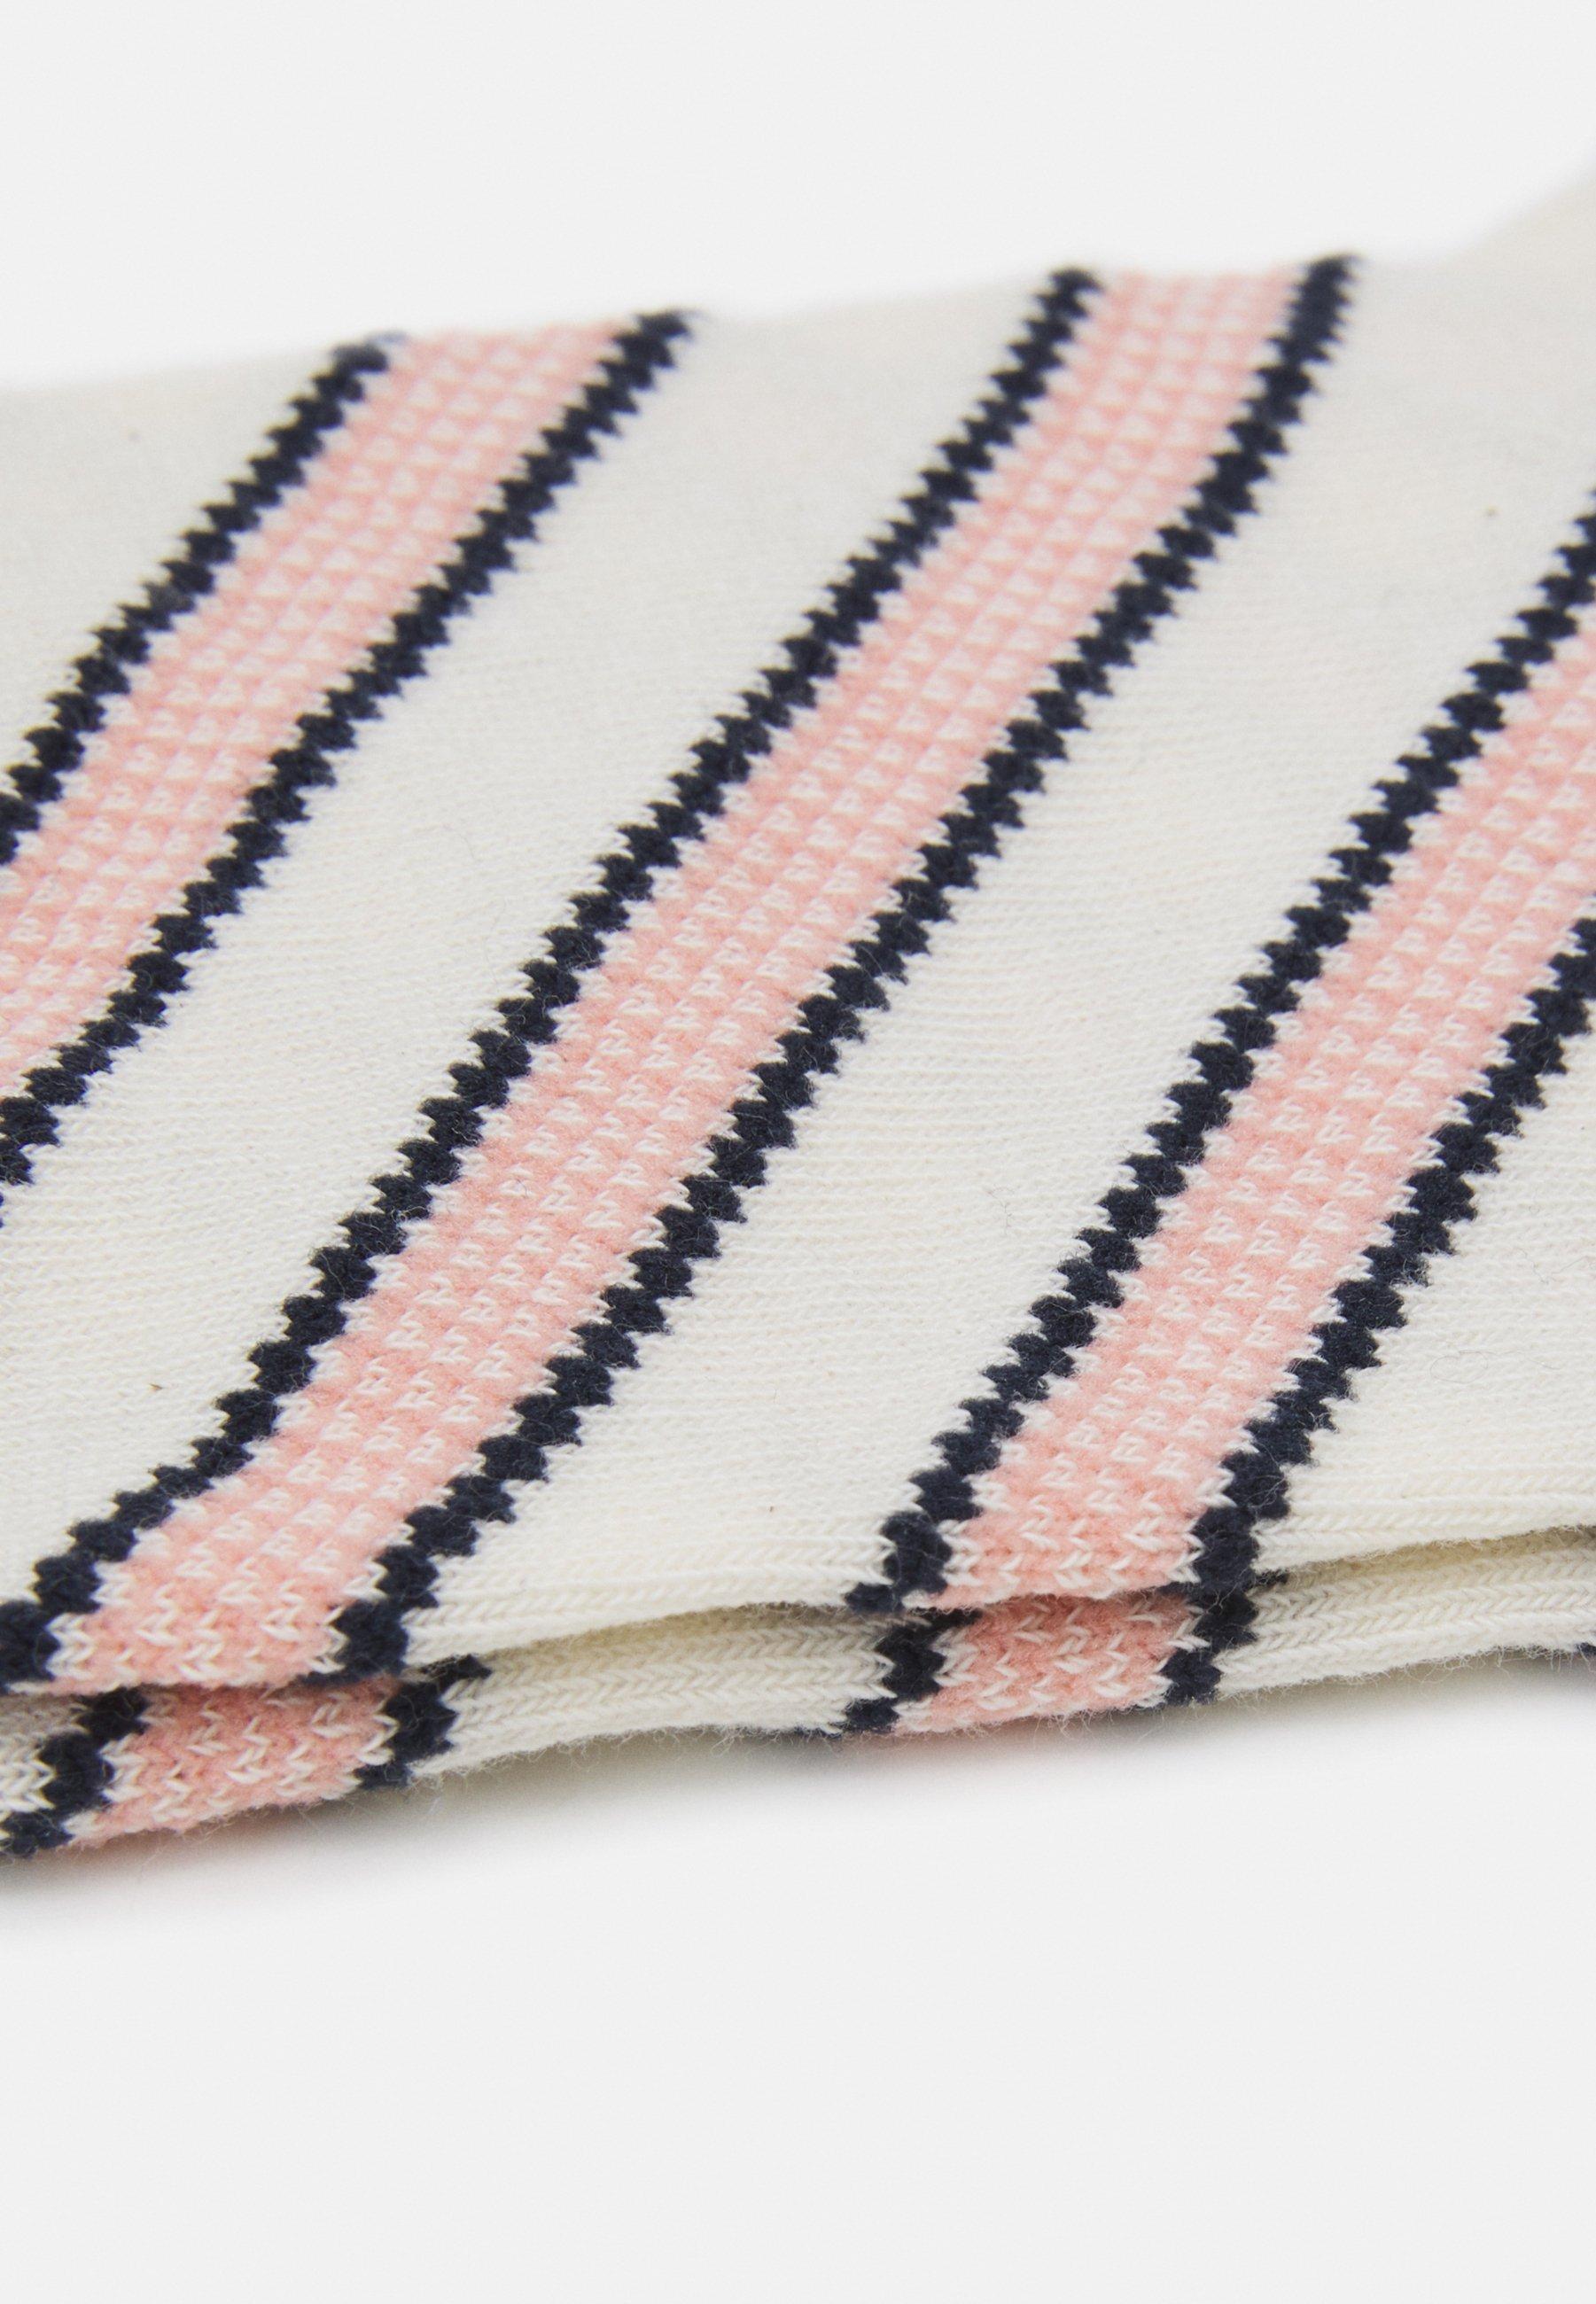 Femme INGRID SLANTS - Chaussettes